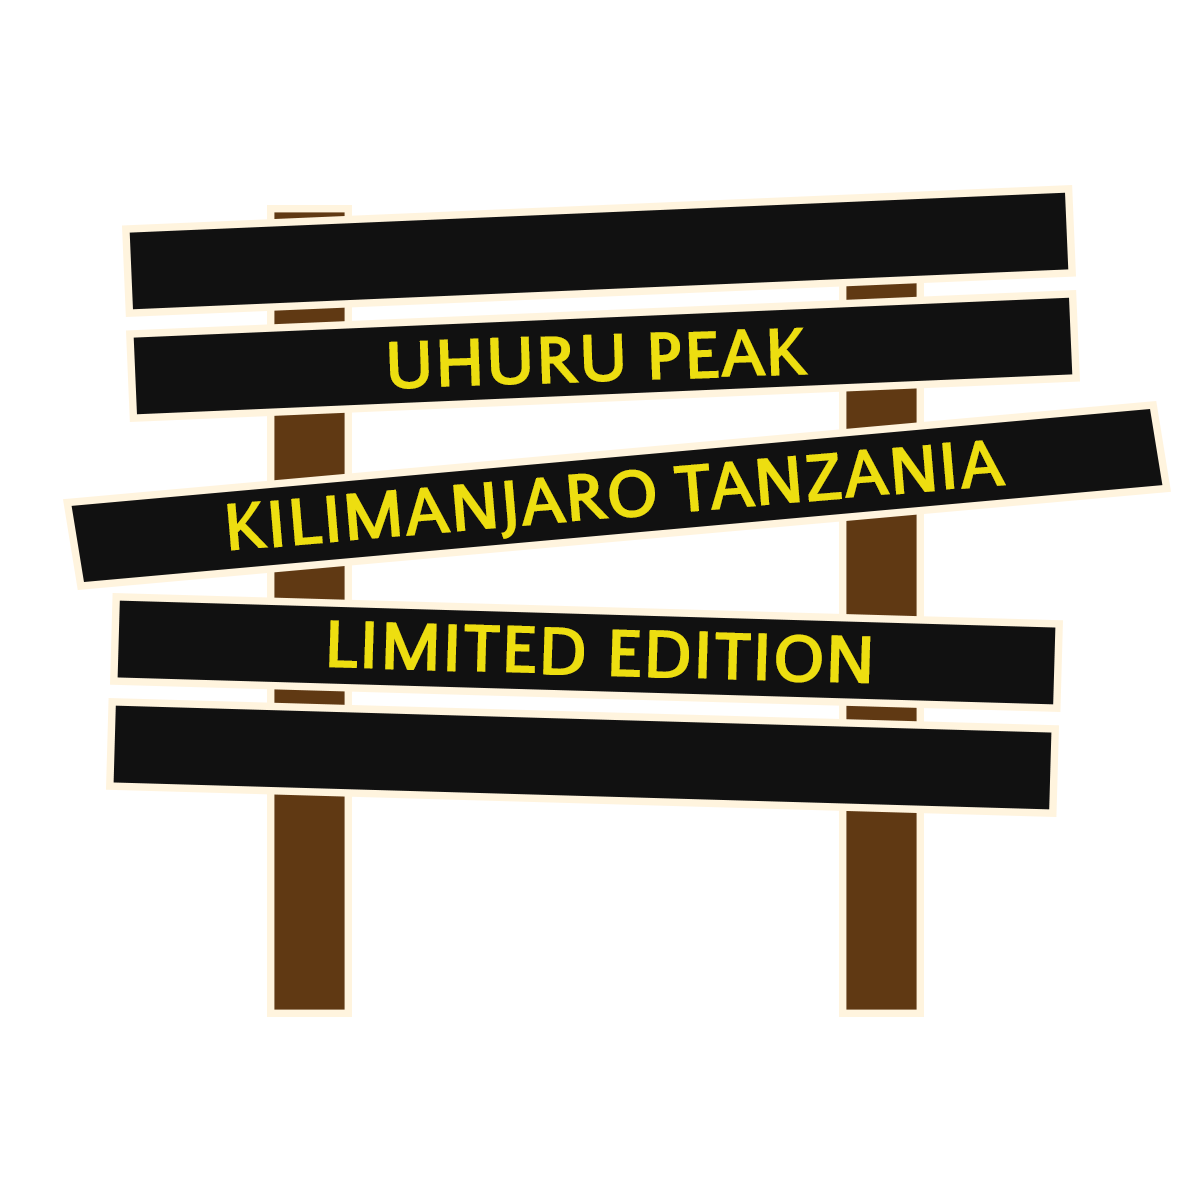 Uhuru Peak is in season - lighter roasted, plummy and surprisingly rich!